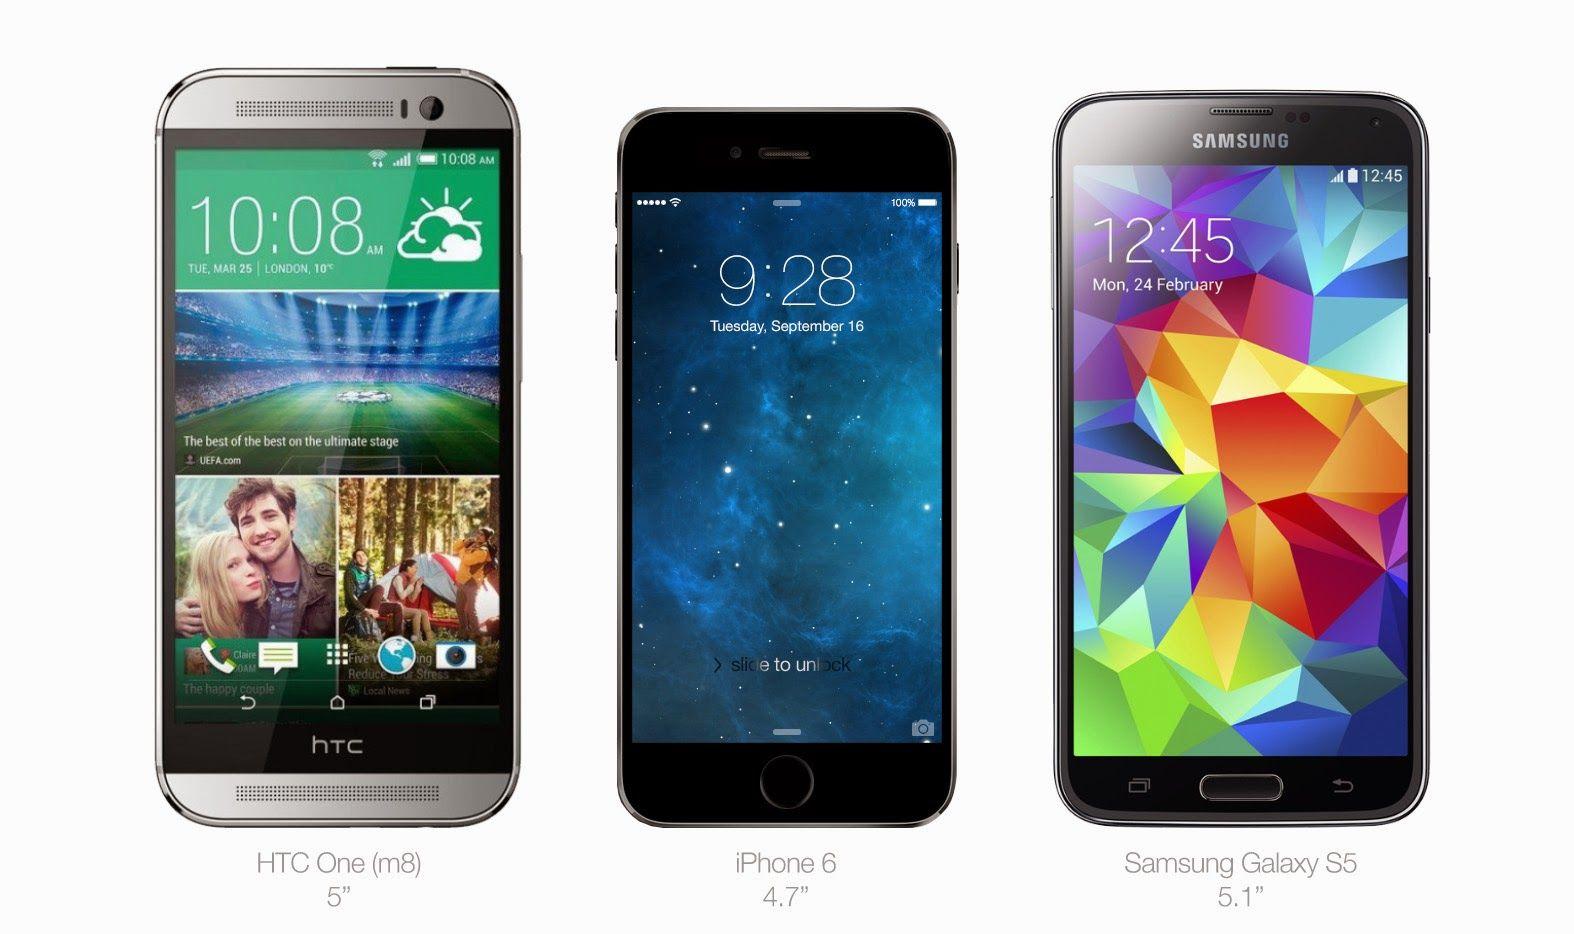 Pin Oleh Dnswr Vision Di Blogging Telepon Samsung Galaxy S5 Iphone 6